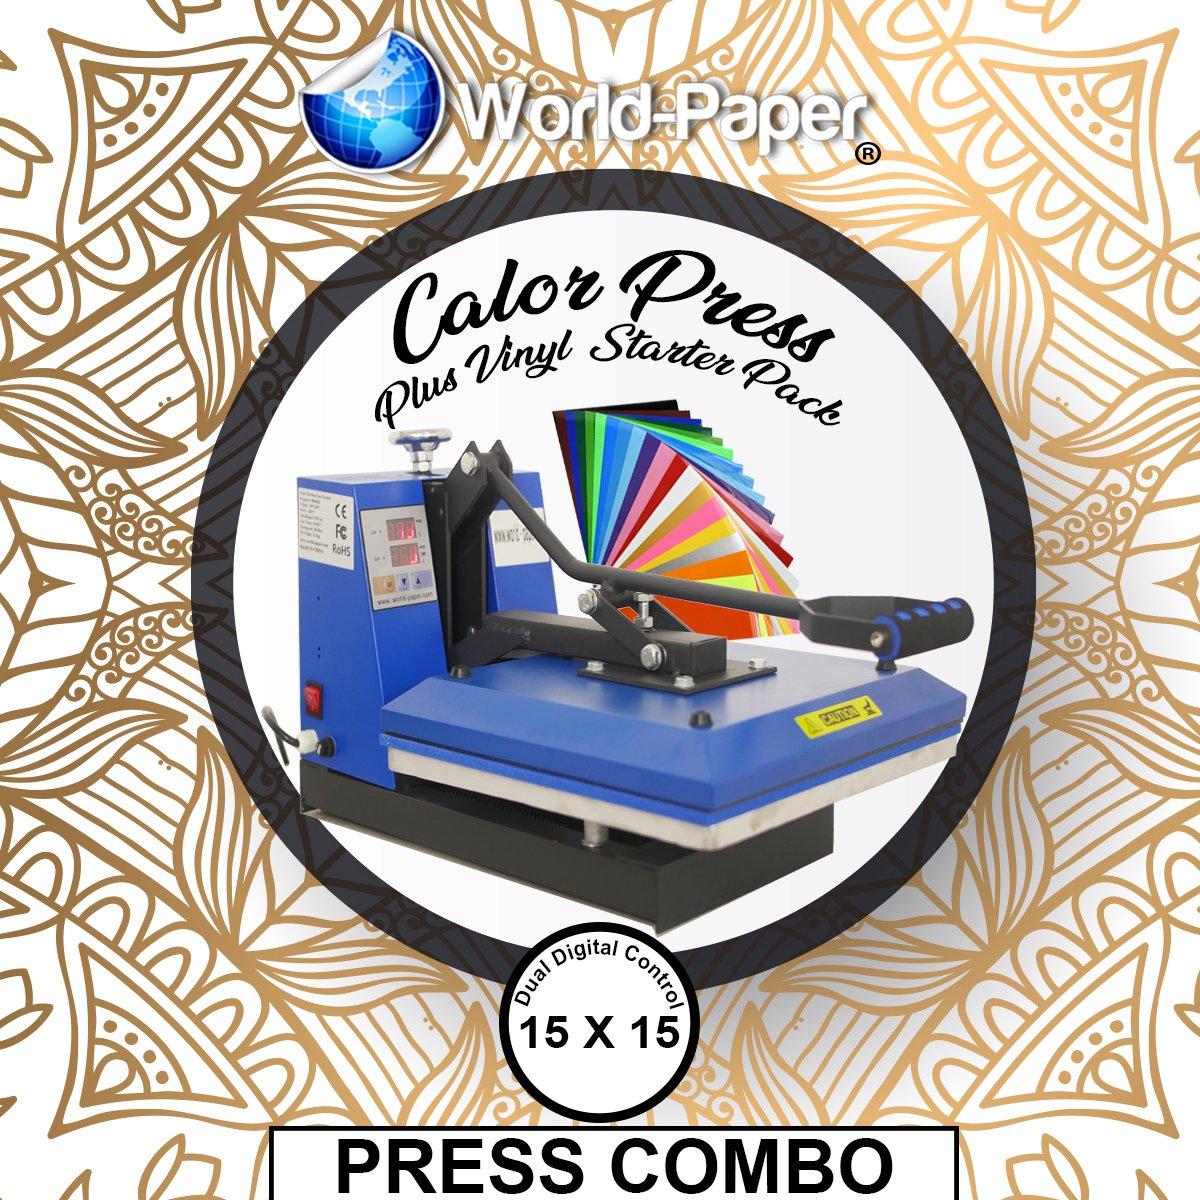 Heat Press Machine 15'' x 15'' Clamshell Manual Press, Sublimation, HTV, Transfer Paper FREE 19 10x12 Vinyl Sheets